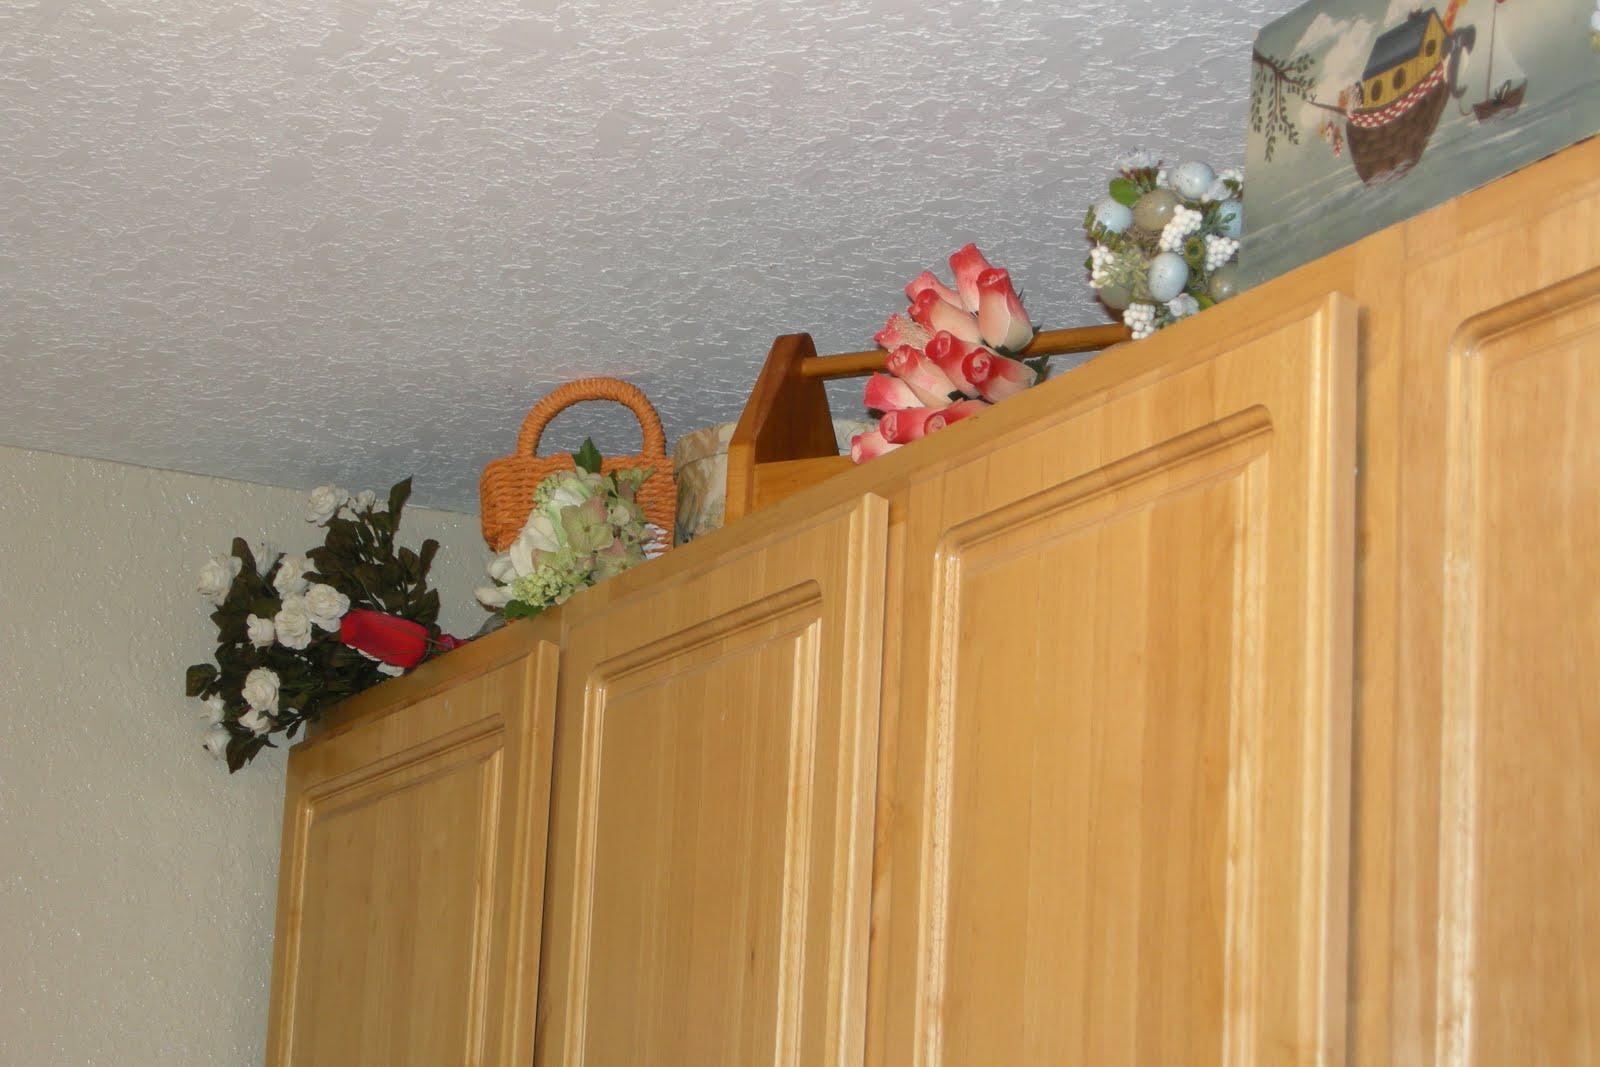 http://2.bp.blogspot.com/_ZWHi2fYLaV4/TH79RTNMK-I/AAAAAAAABUg/9QJHSH8_oIU/s1600/Wallpaper+up+in+laundry+room+(8).JPG